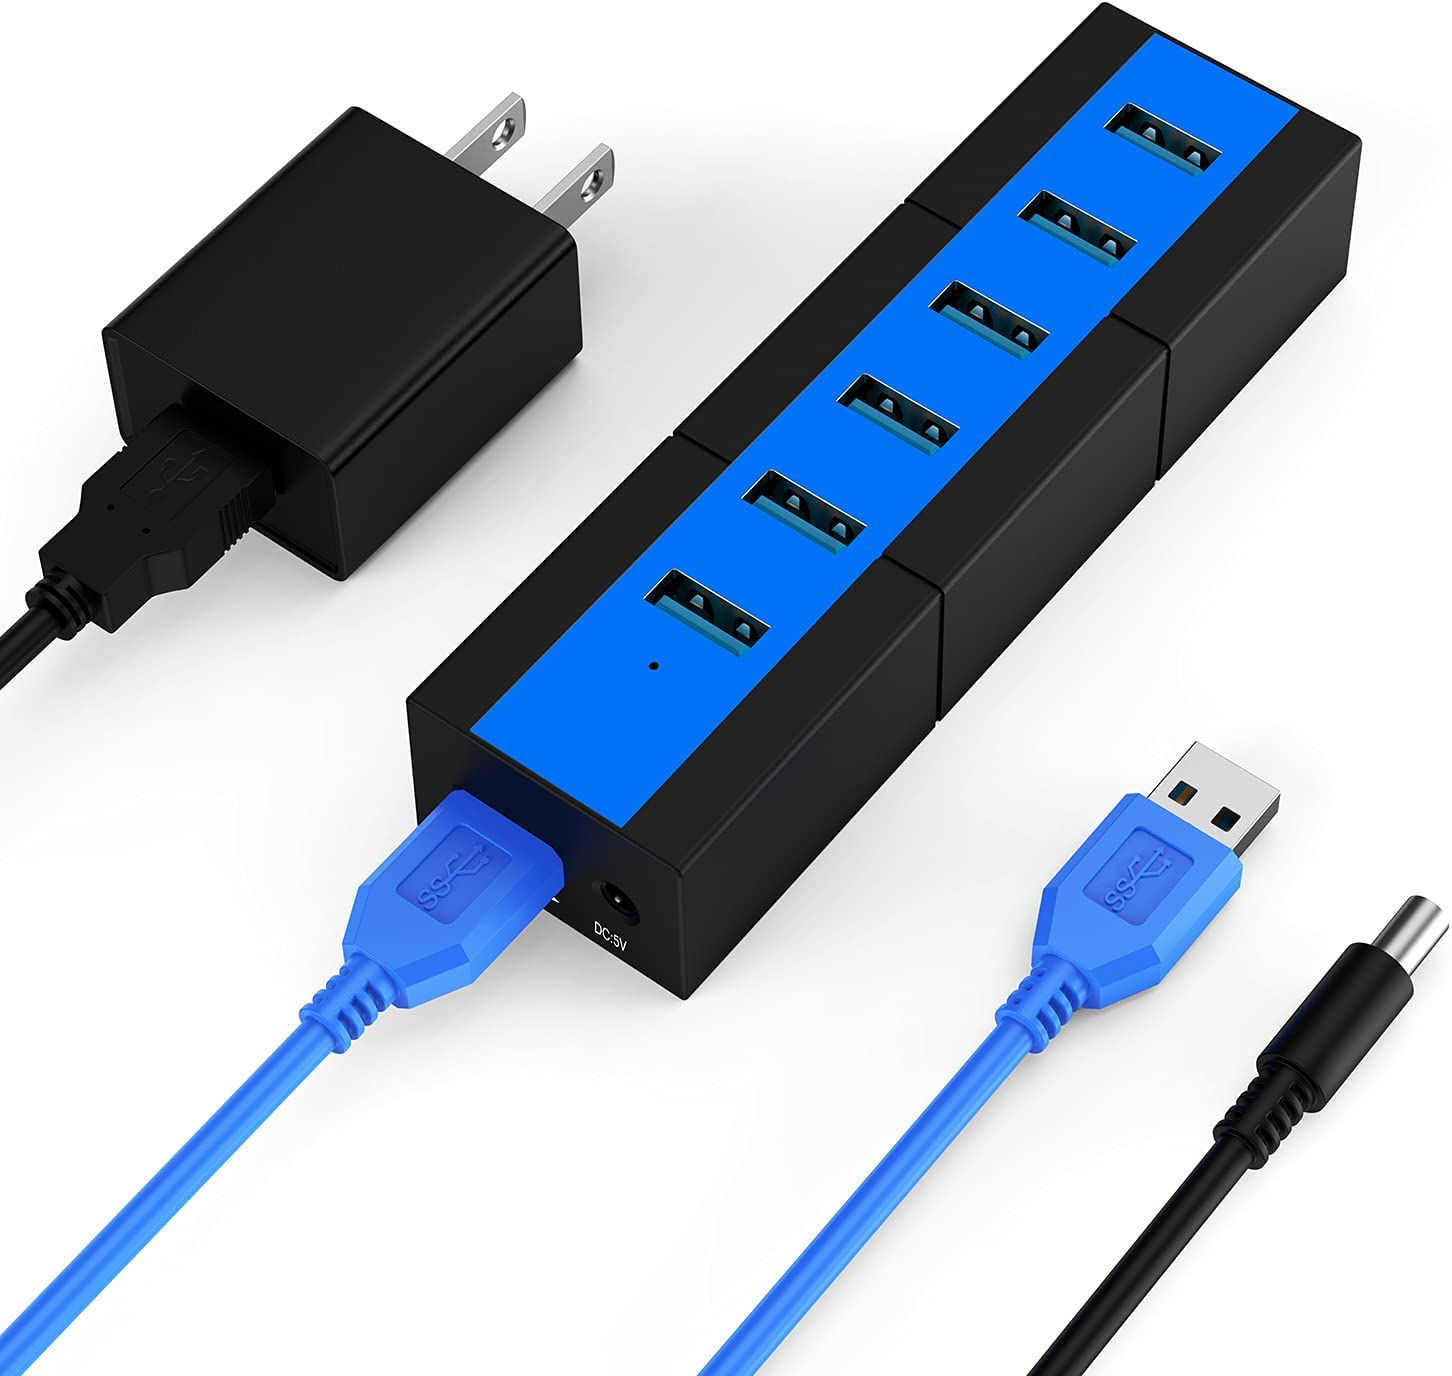 USB 3.0 Hub K&ZZ 6 Port 10W Data Hub Powered USB Hub USB Port Expander USB Splitter for Laptop, PC, Mobile HDD, USB Flash Drive, Blue